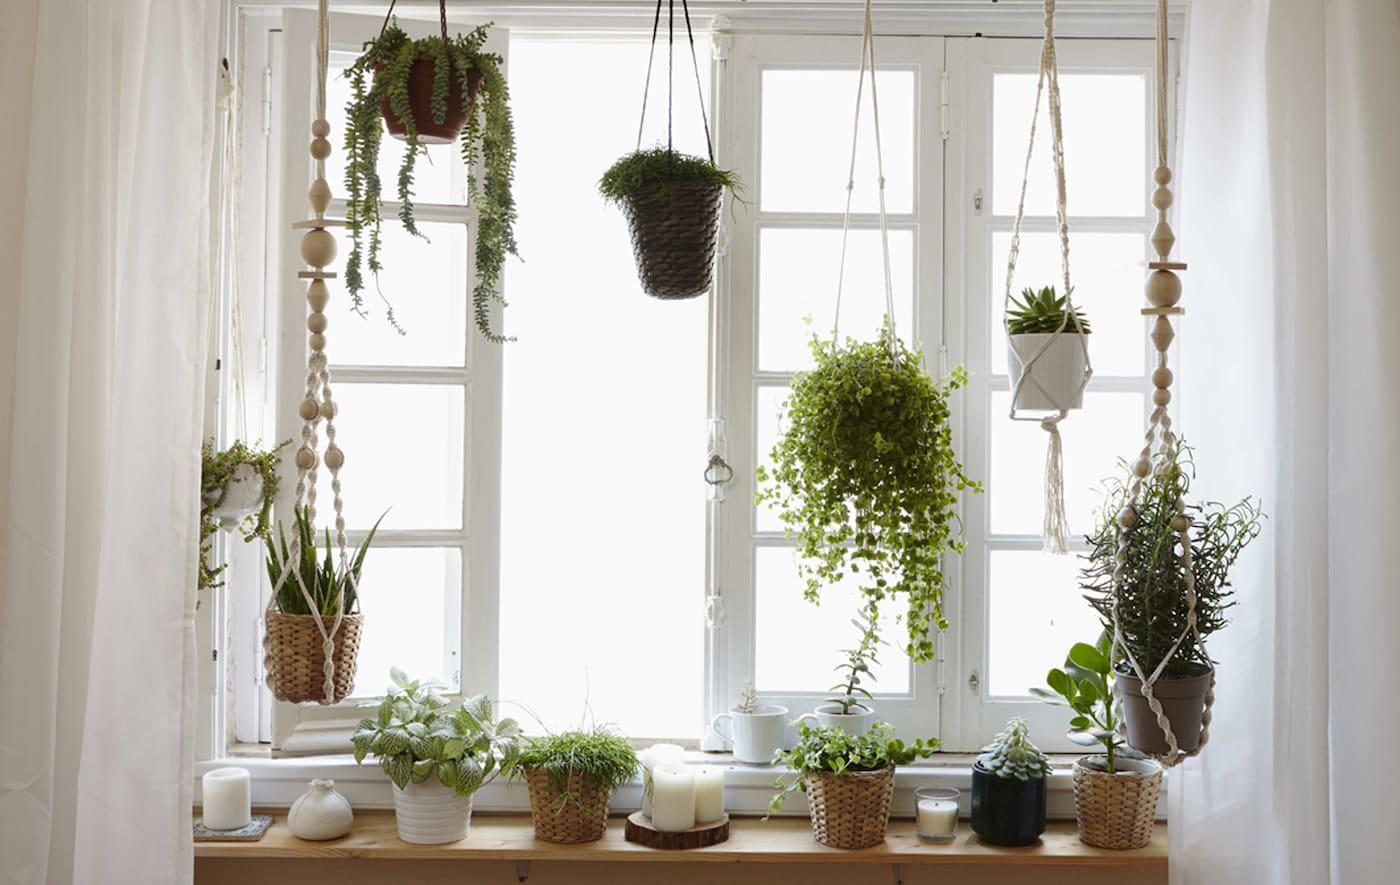 Grow a window garden at home